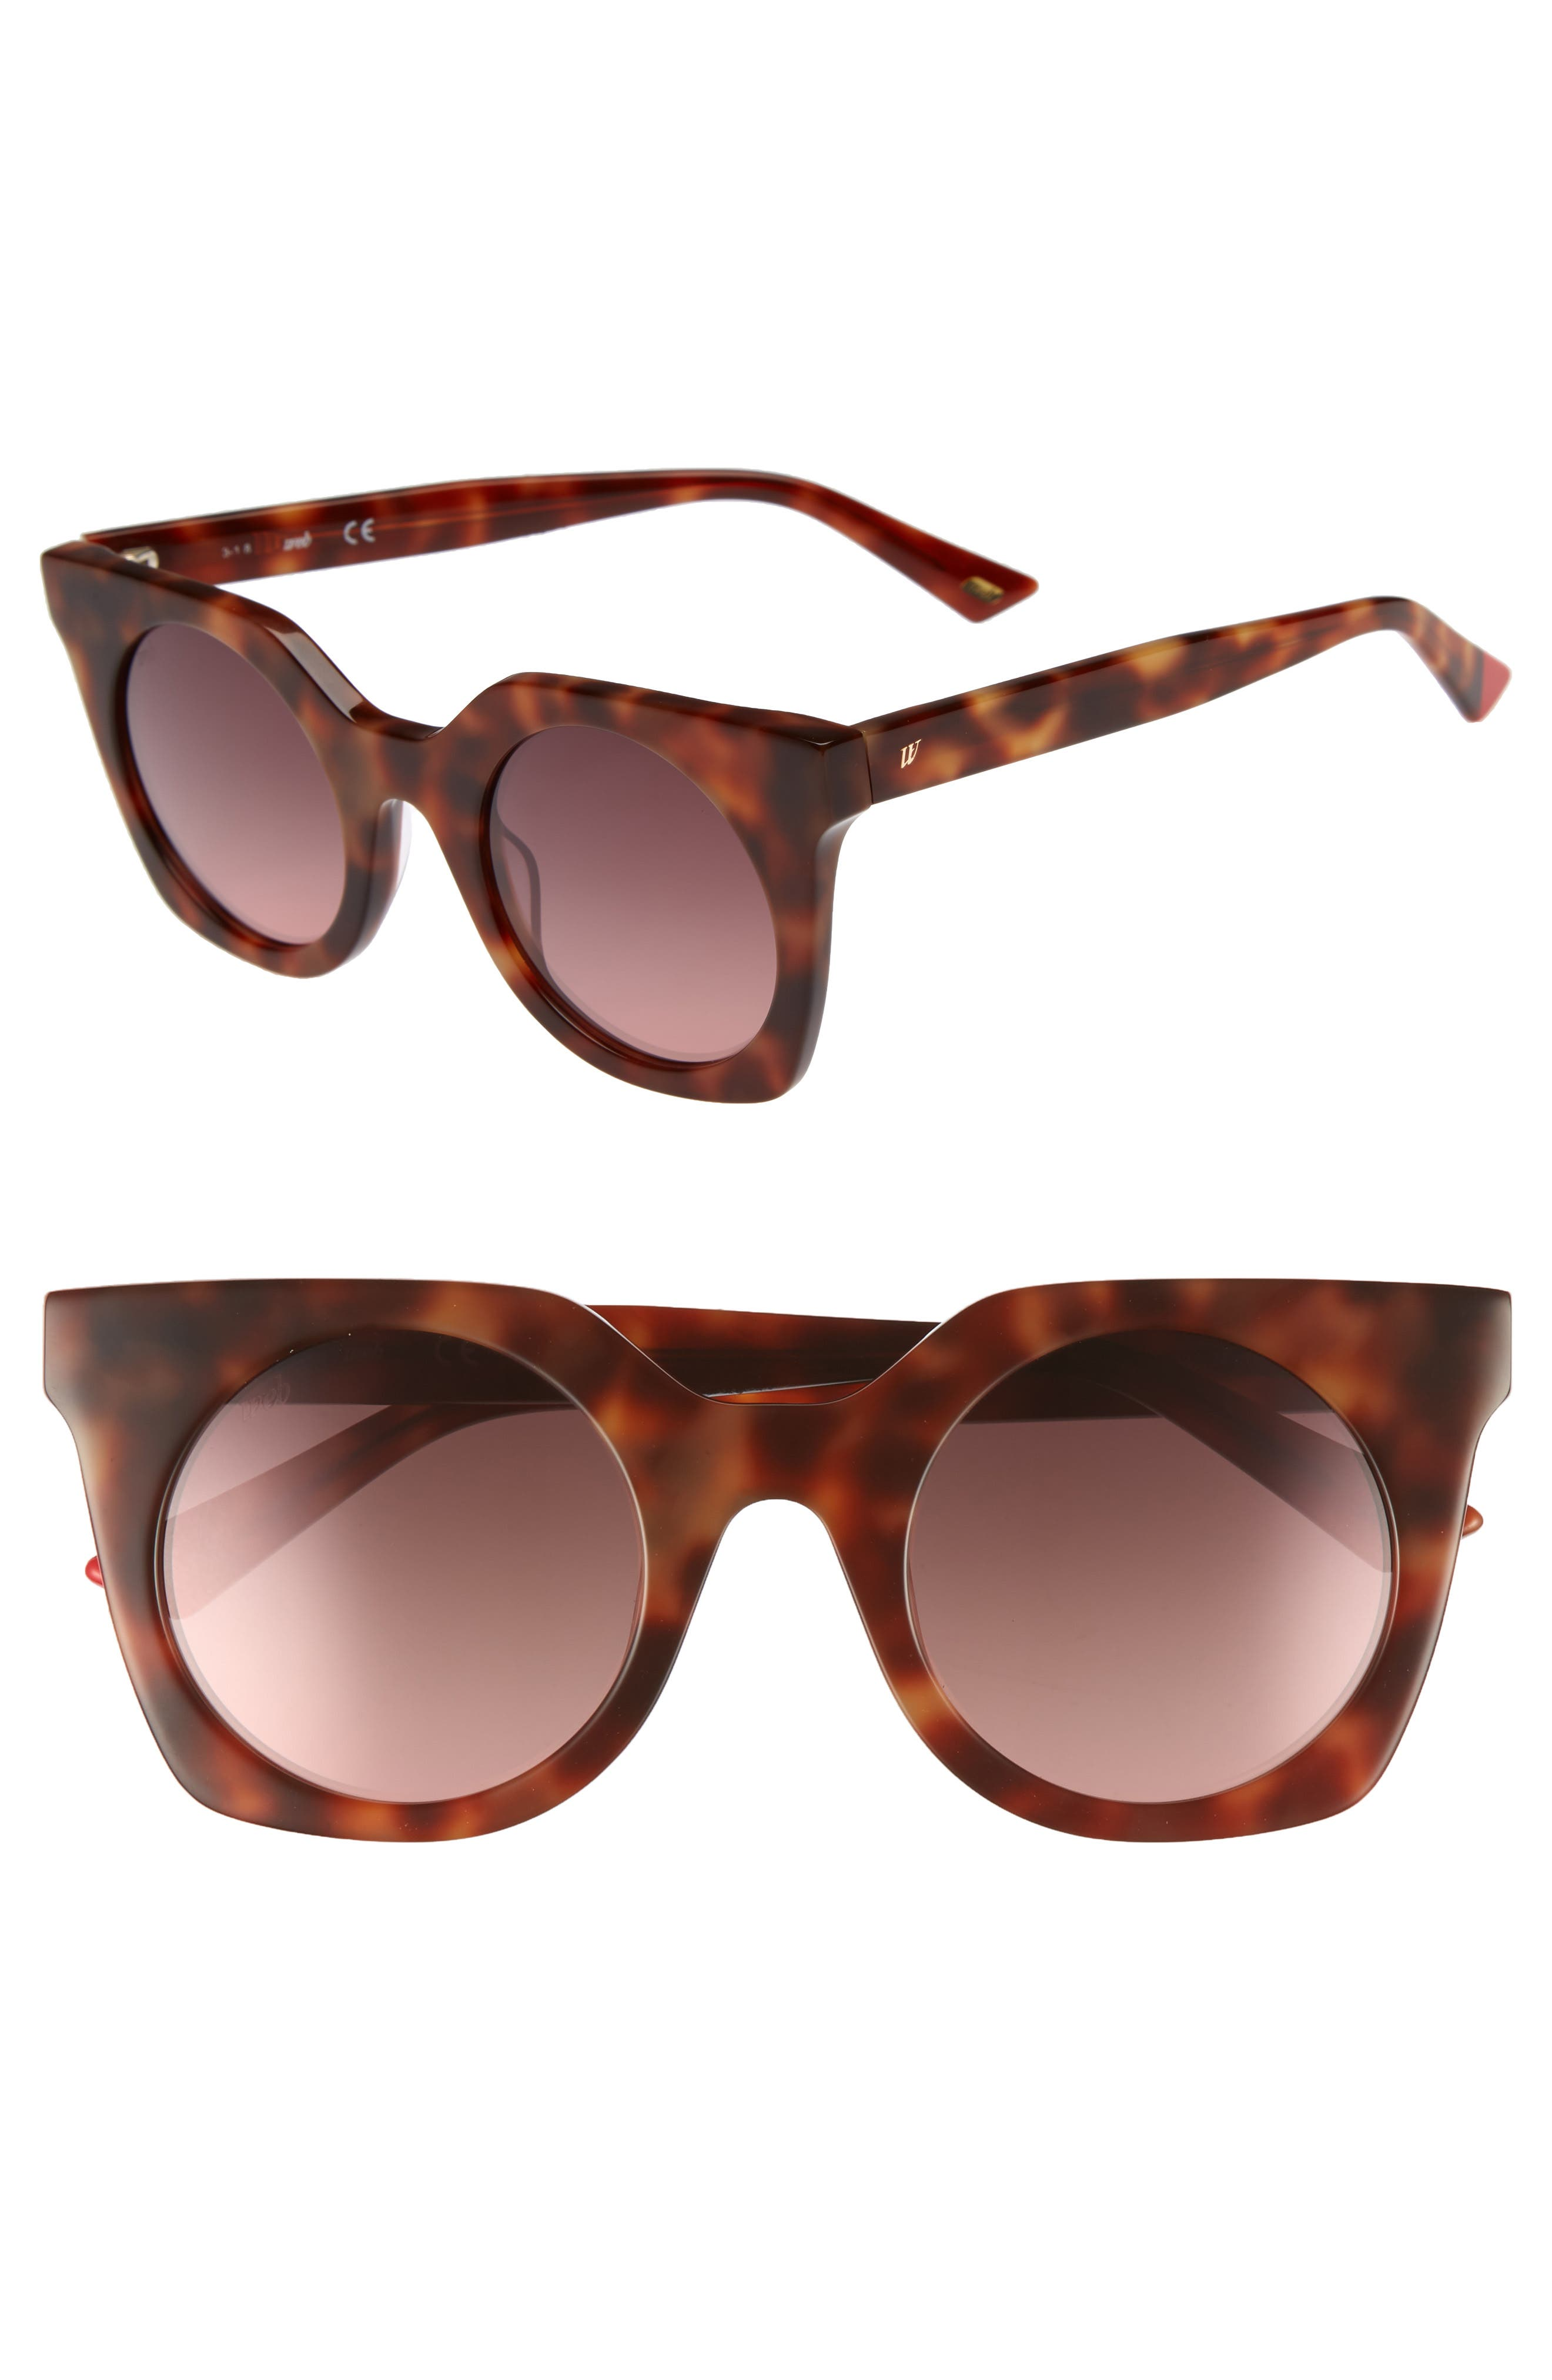 48mm Sunglasses,                         Main,                         color, BLONDE HAVANA/ GRADIENT